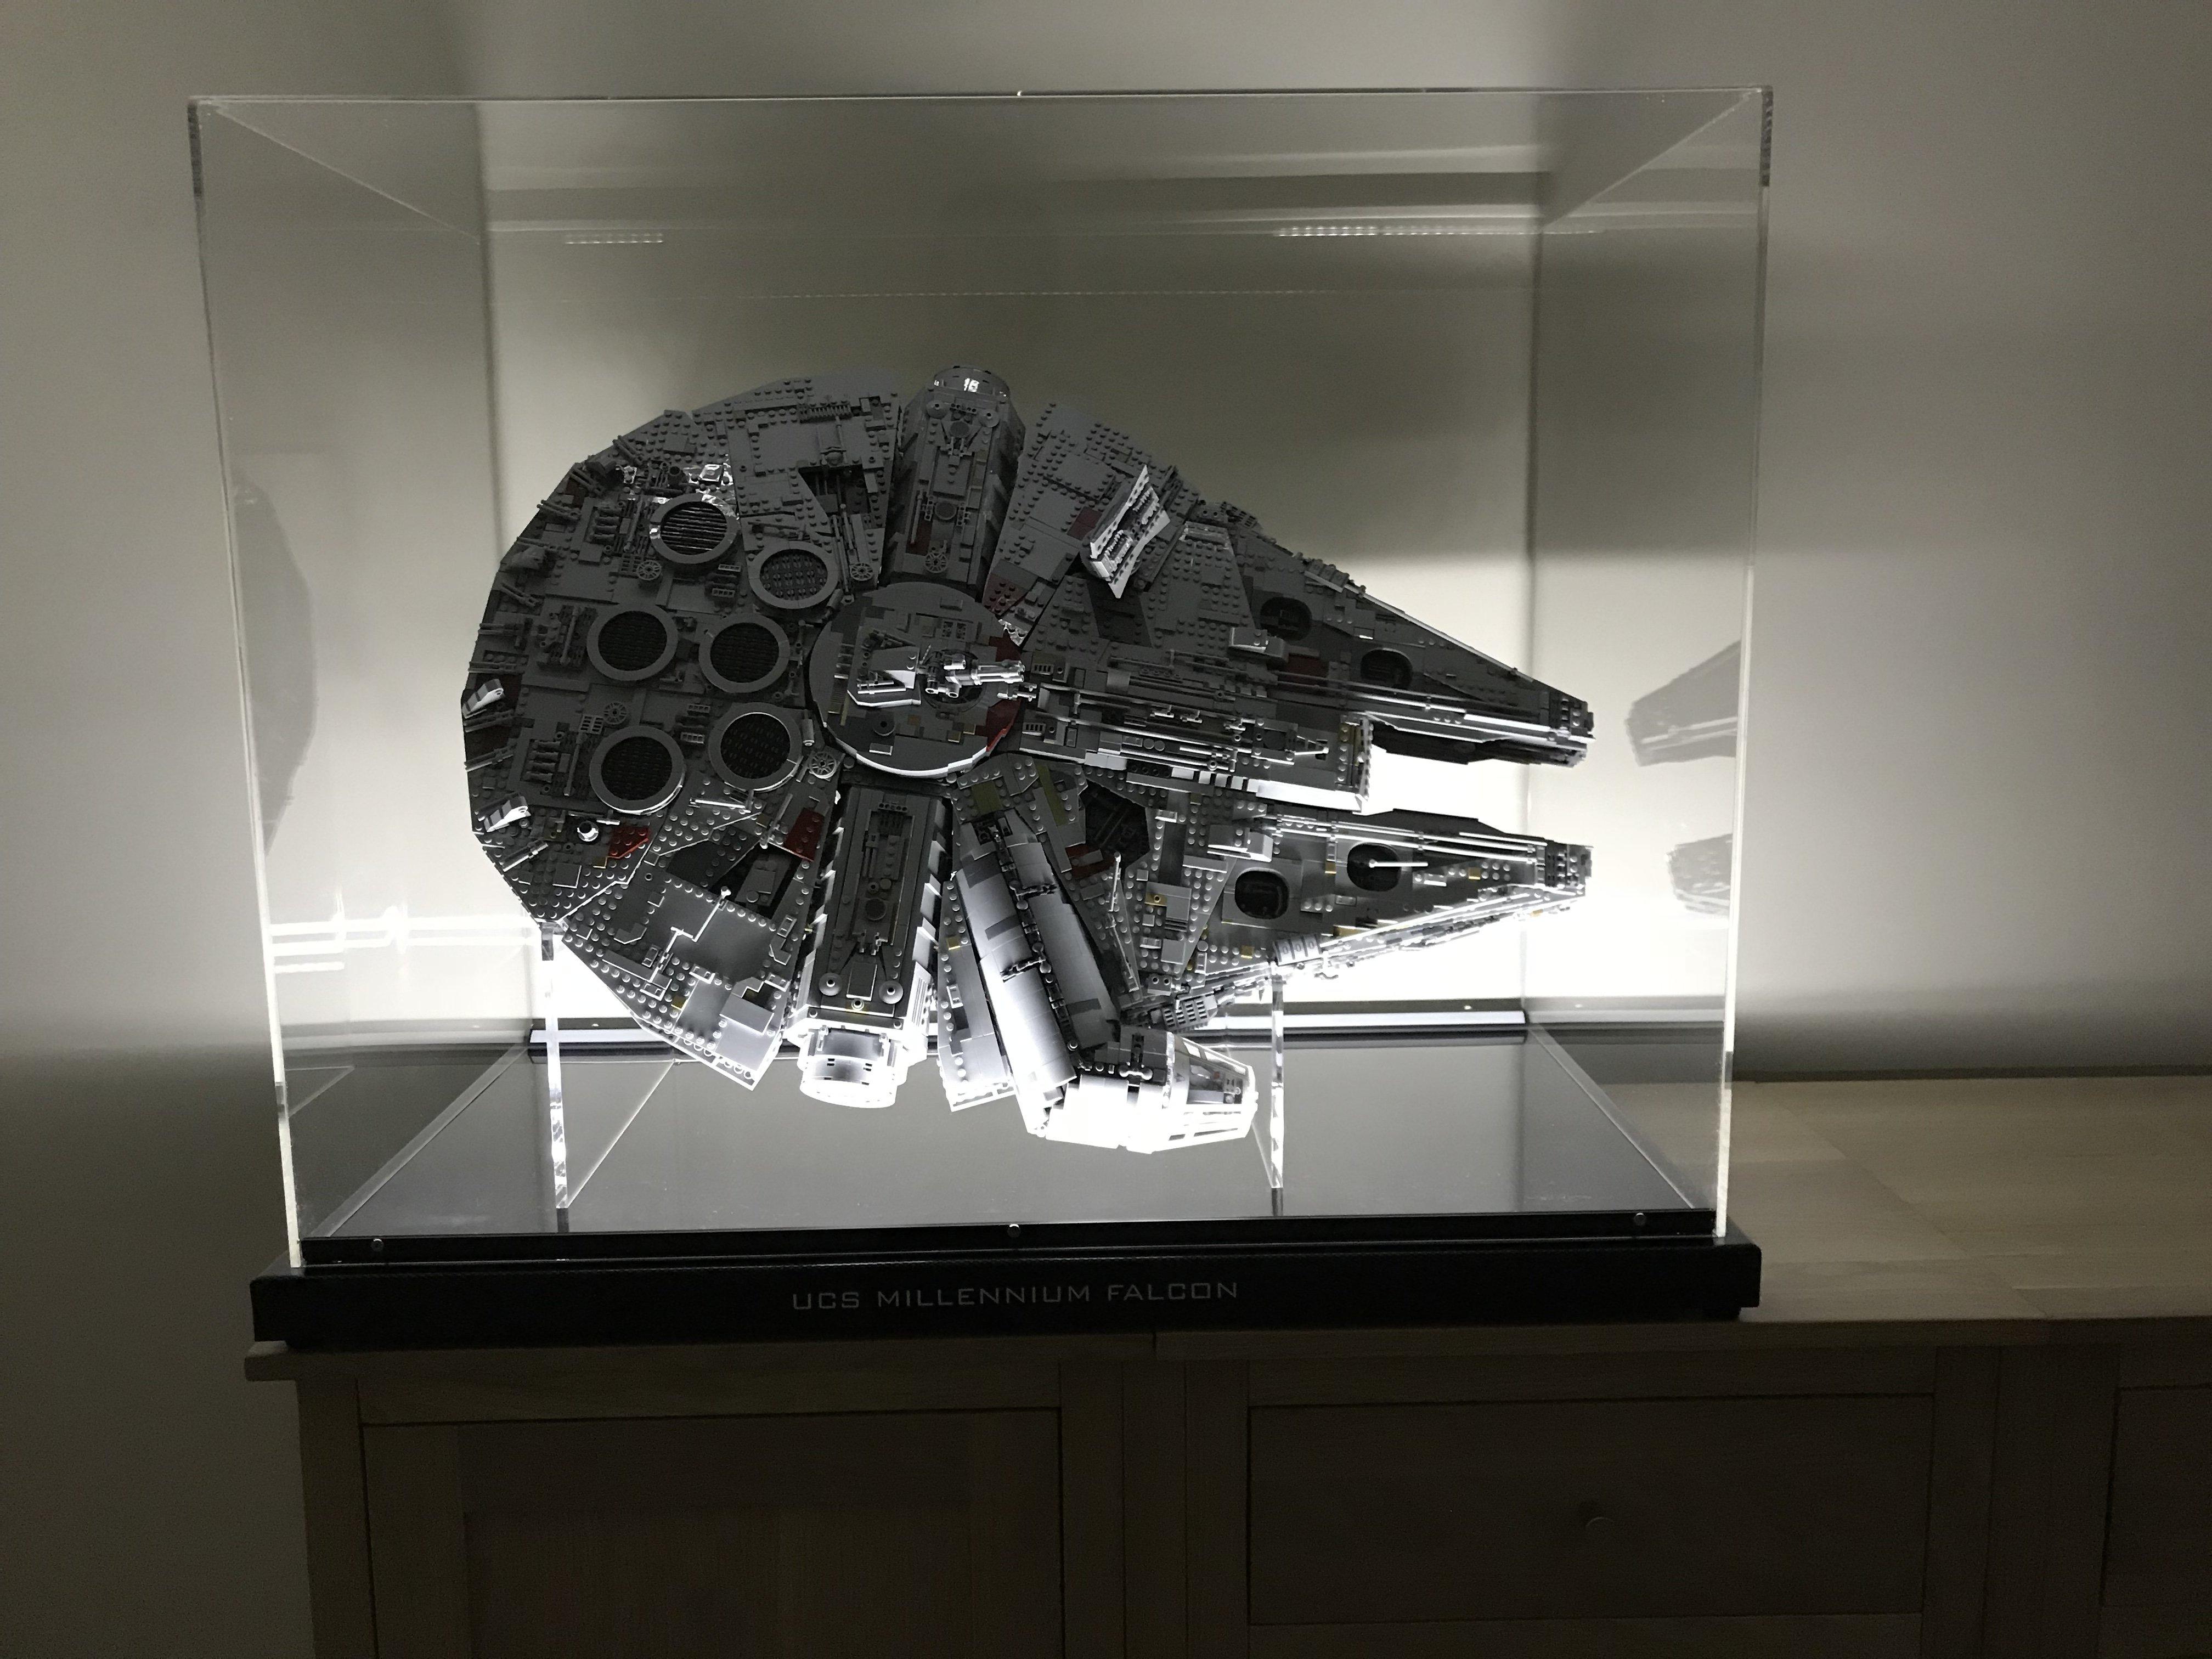 75192 Ucs Millennium Falcon Display Ideas Stands